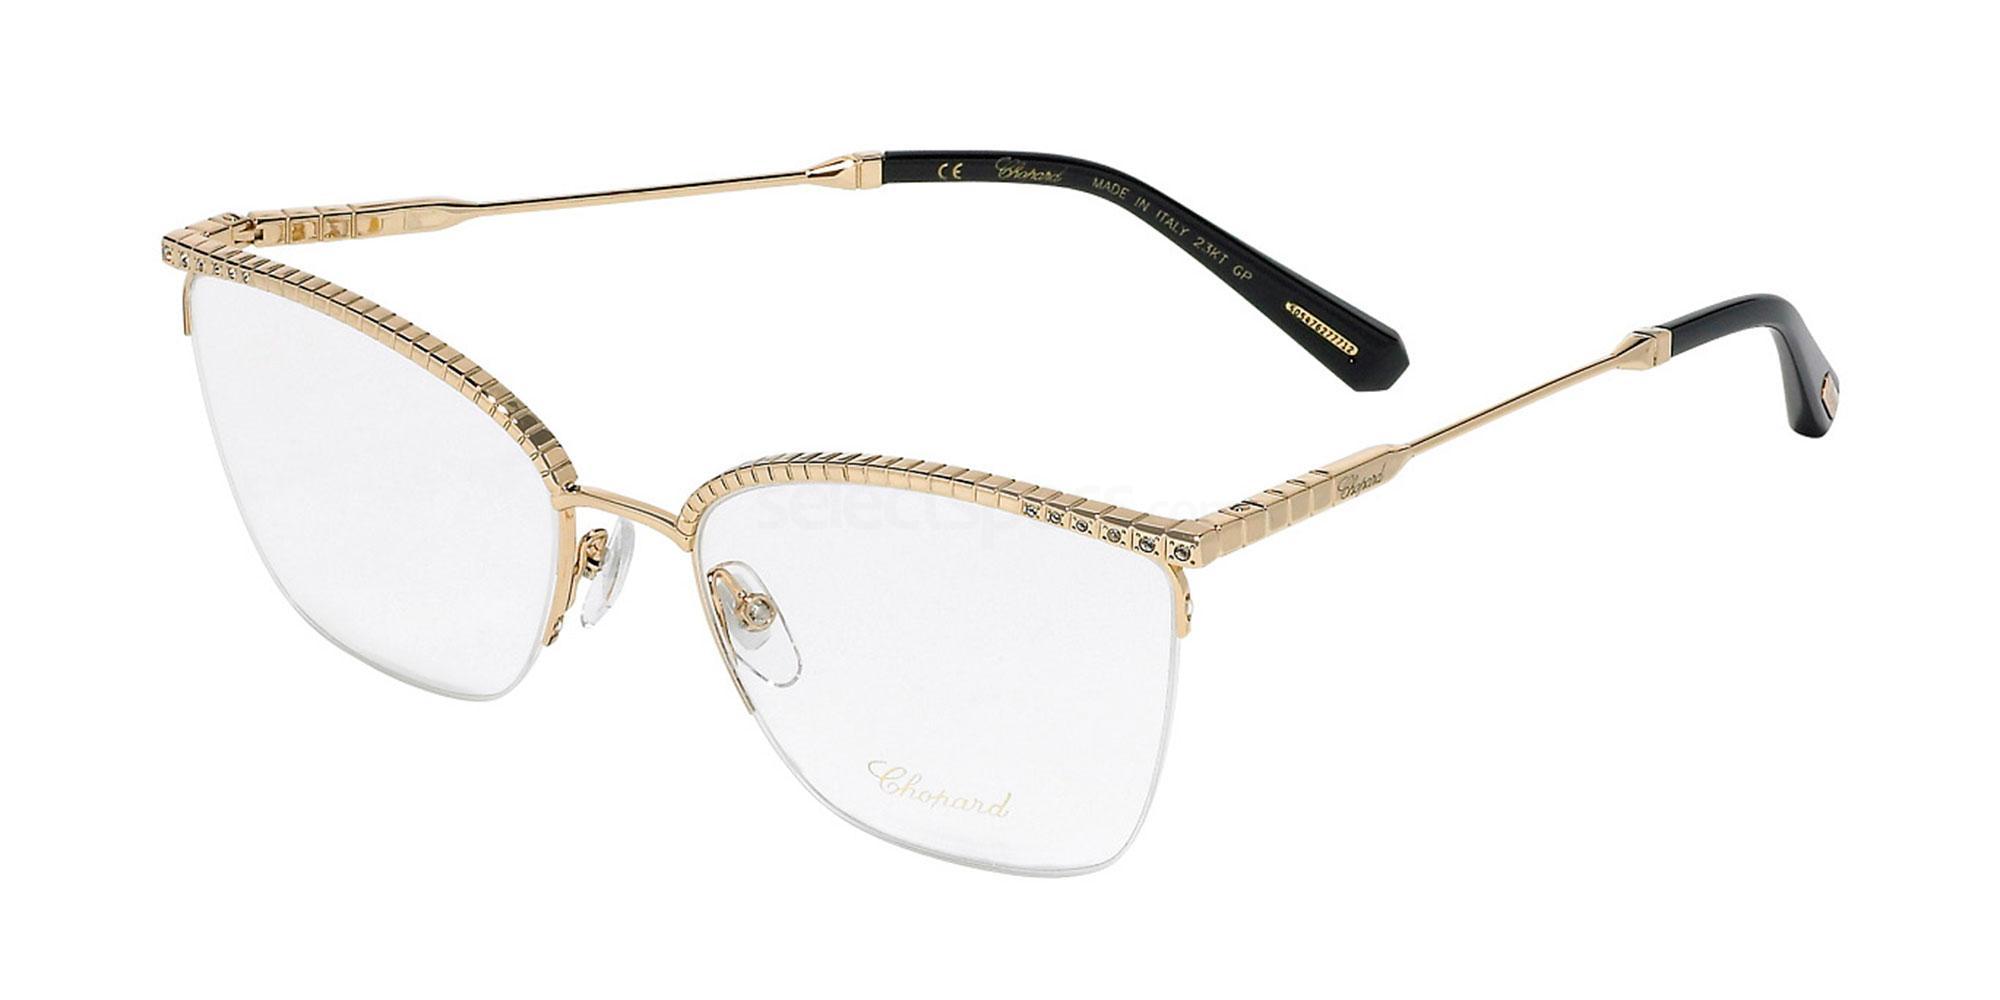 0300 VCHD13S Glasses, Chopard